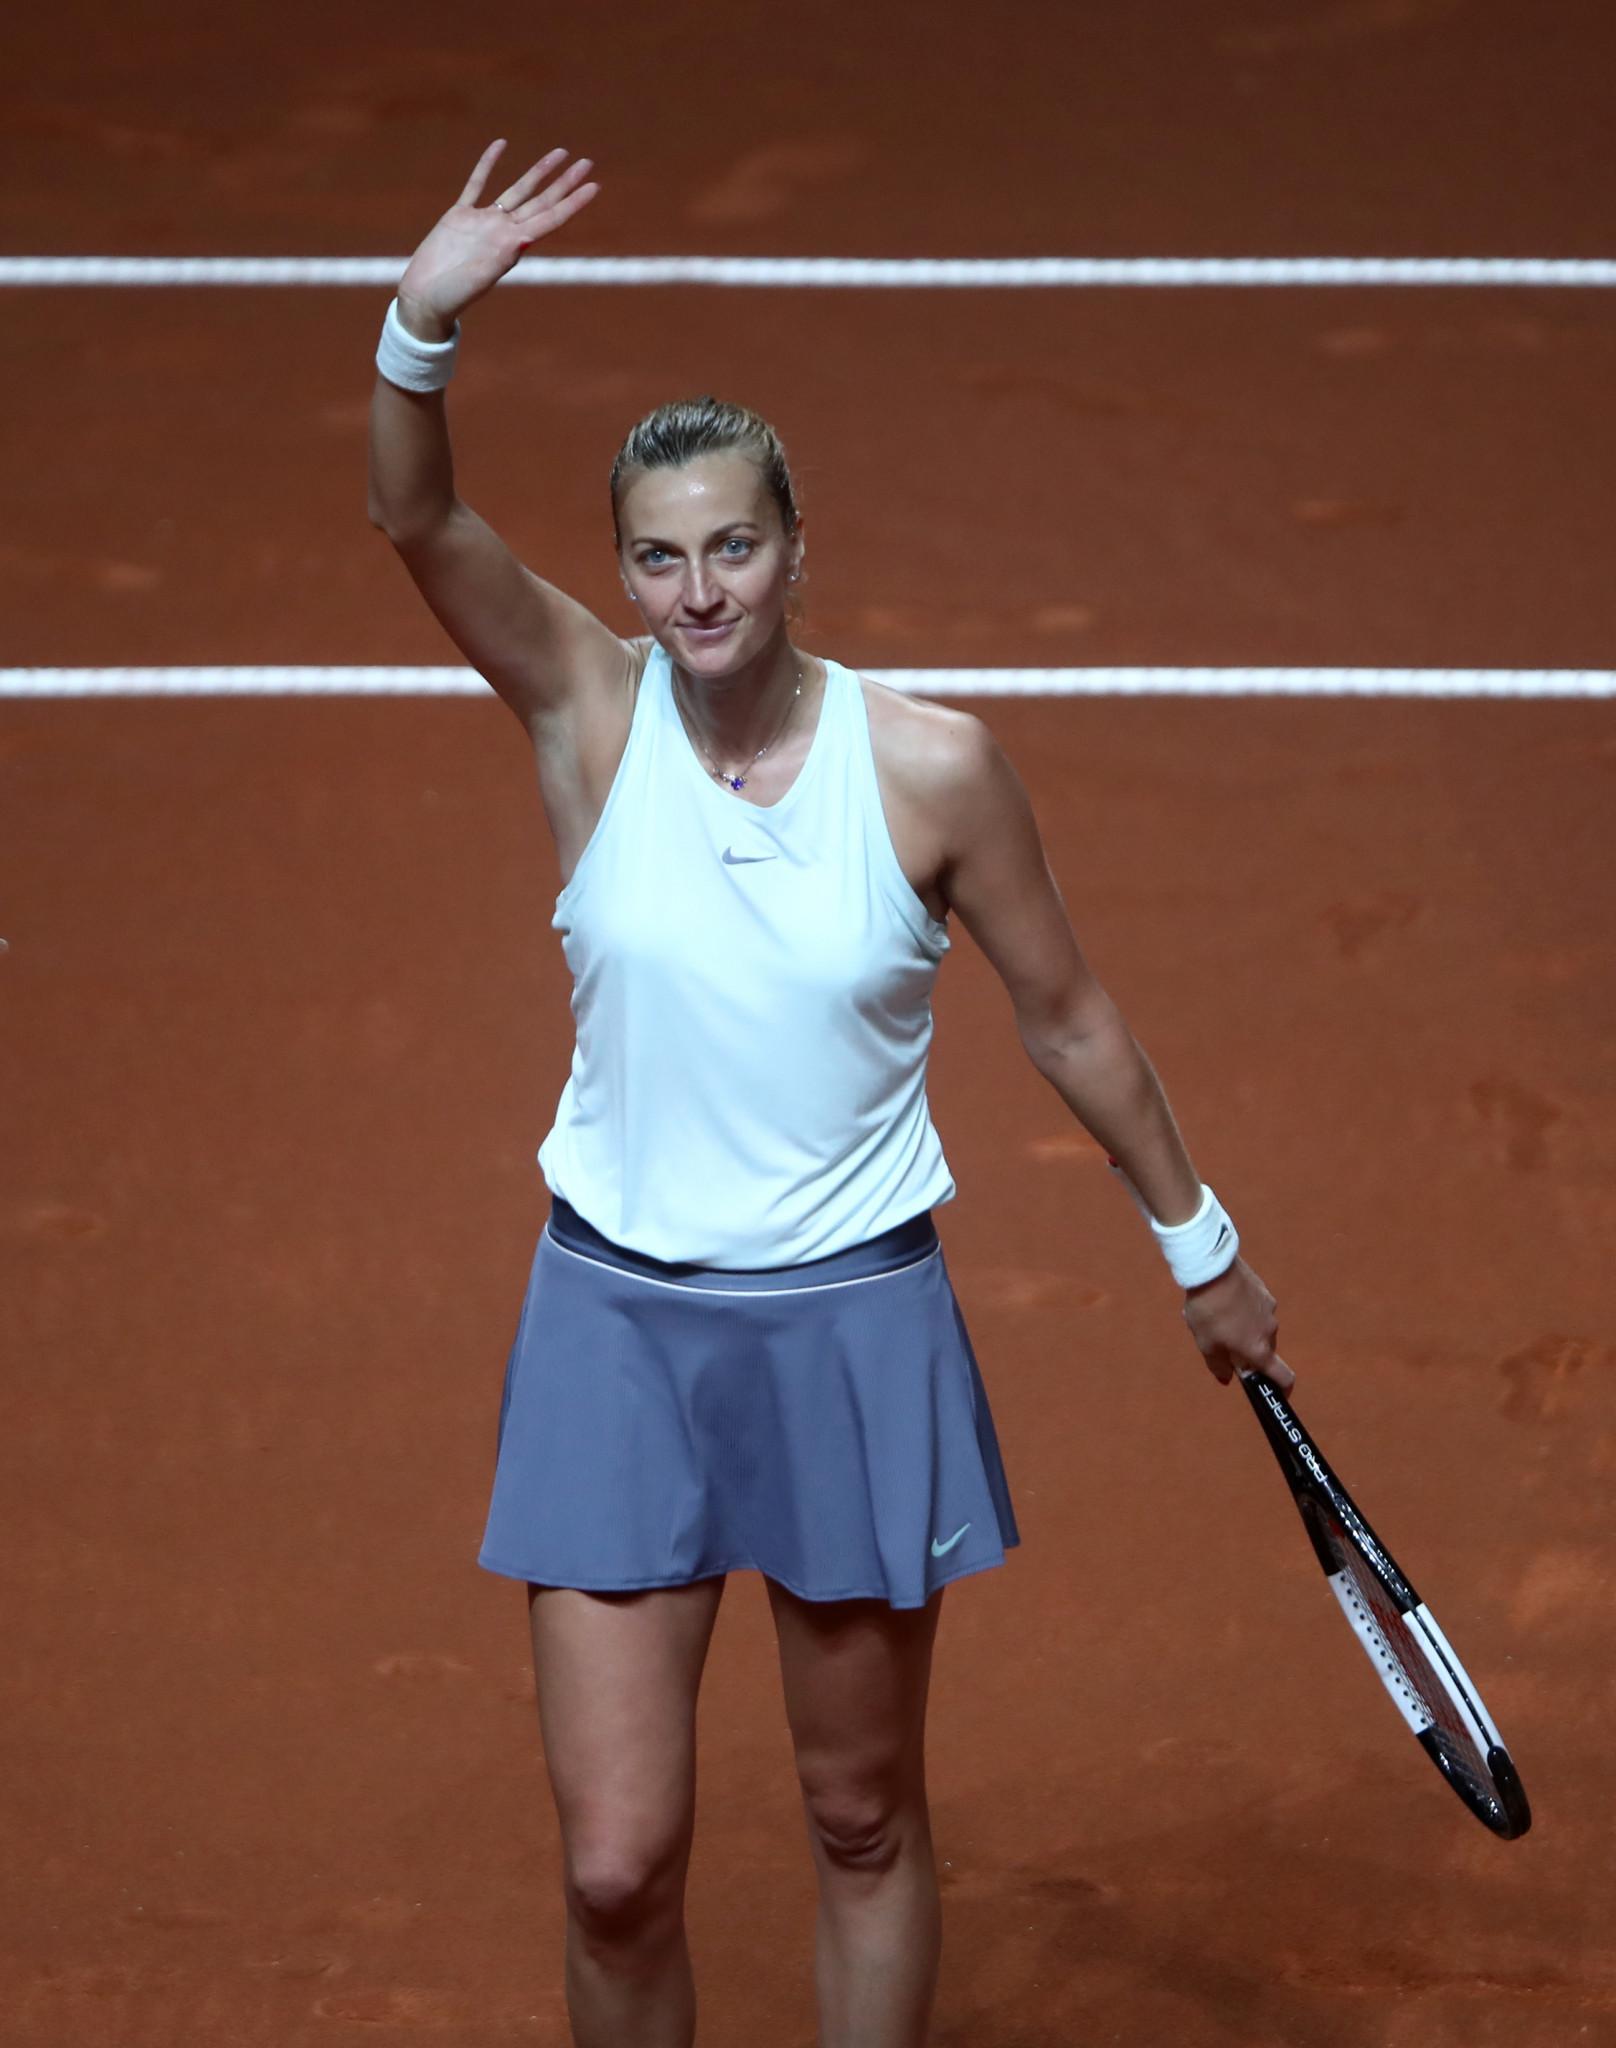 Kvitová survives scare to earn place in Stuttgart Open semi-finals